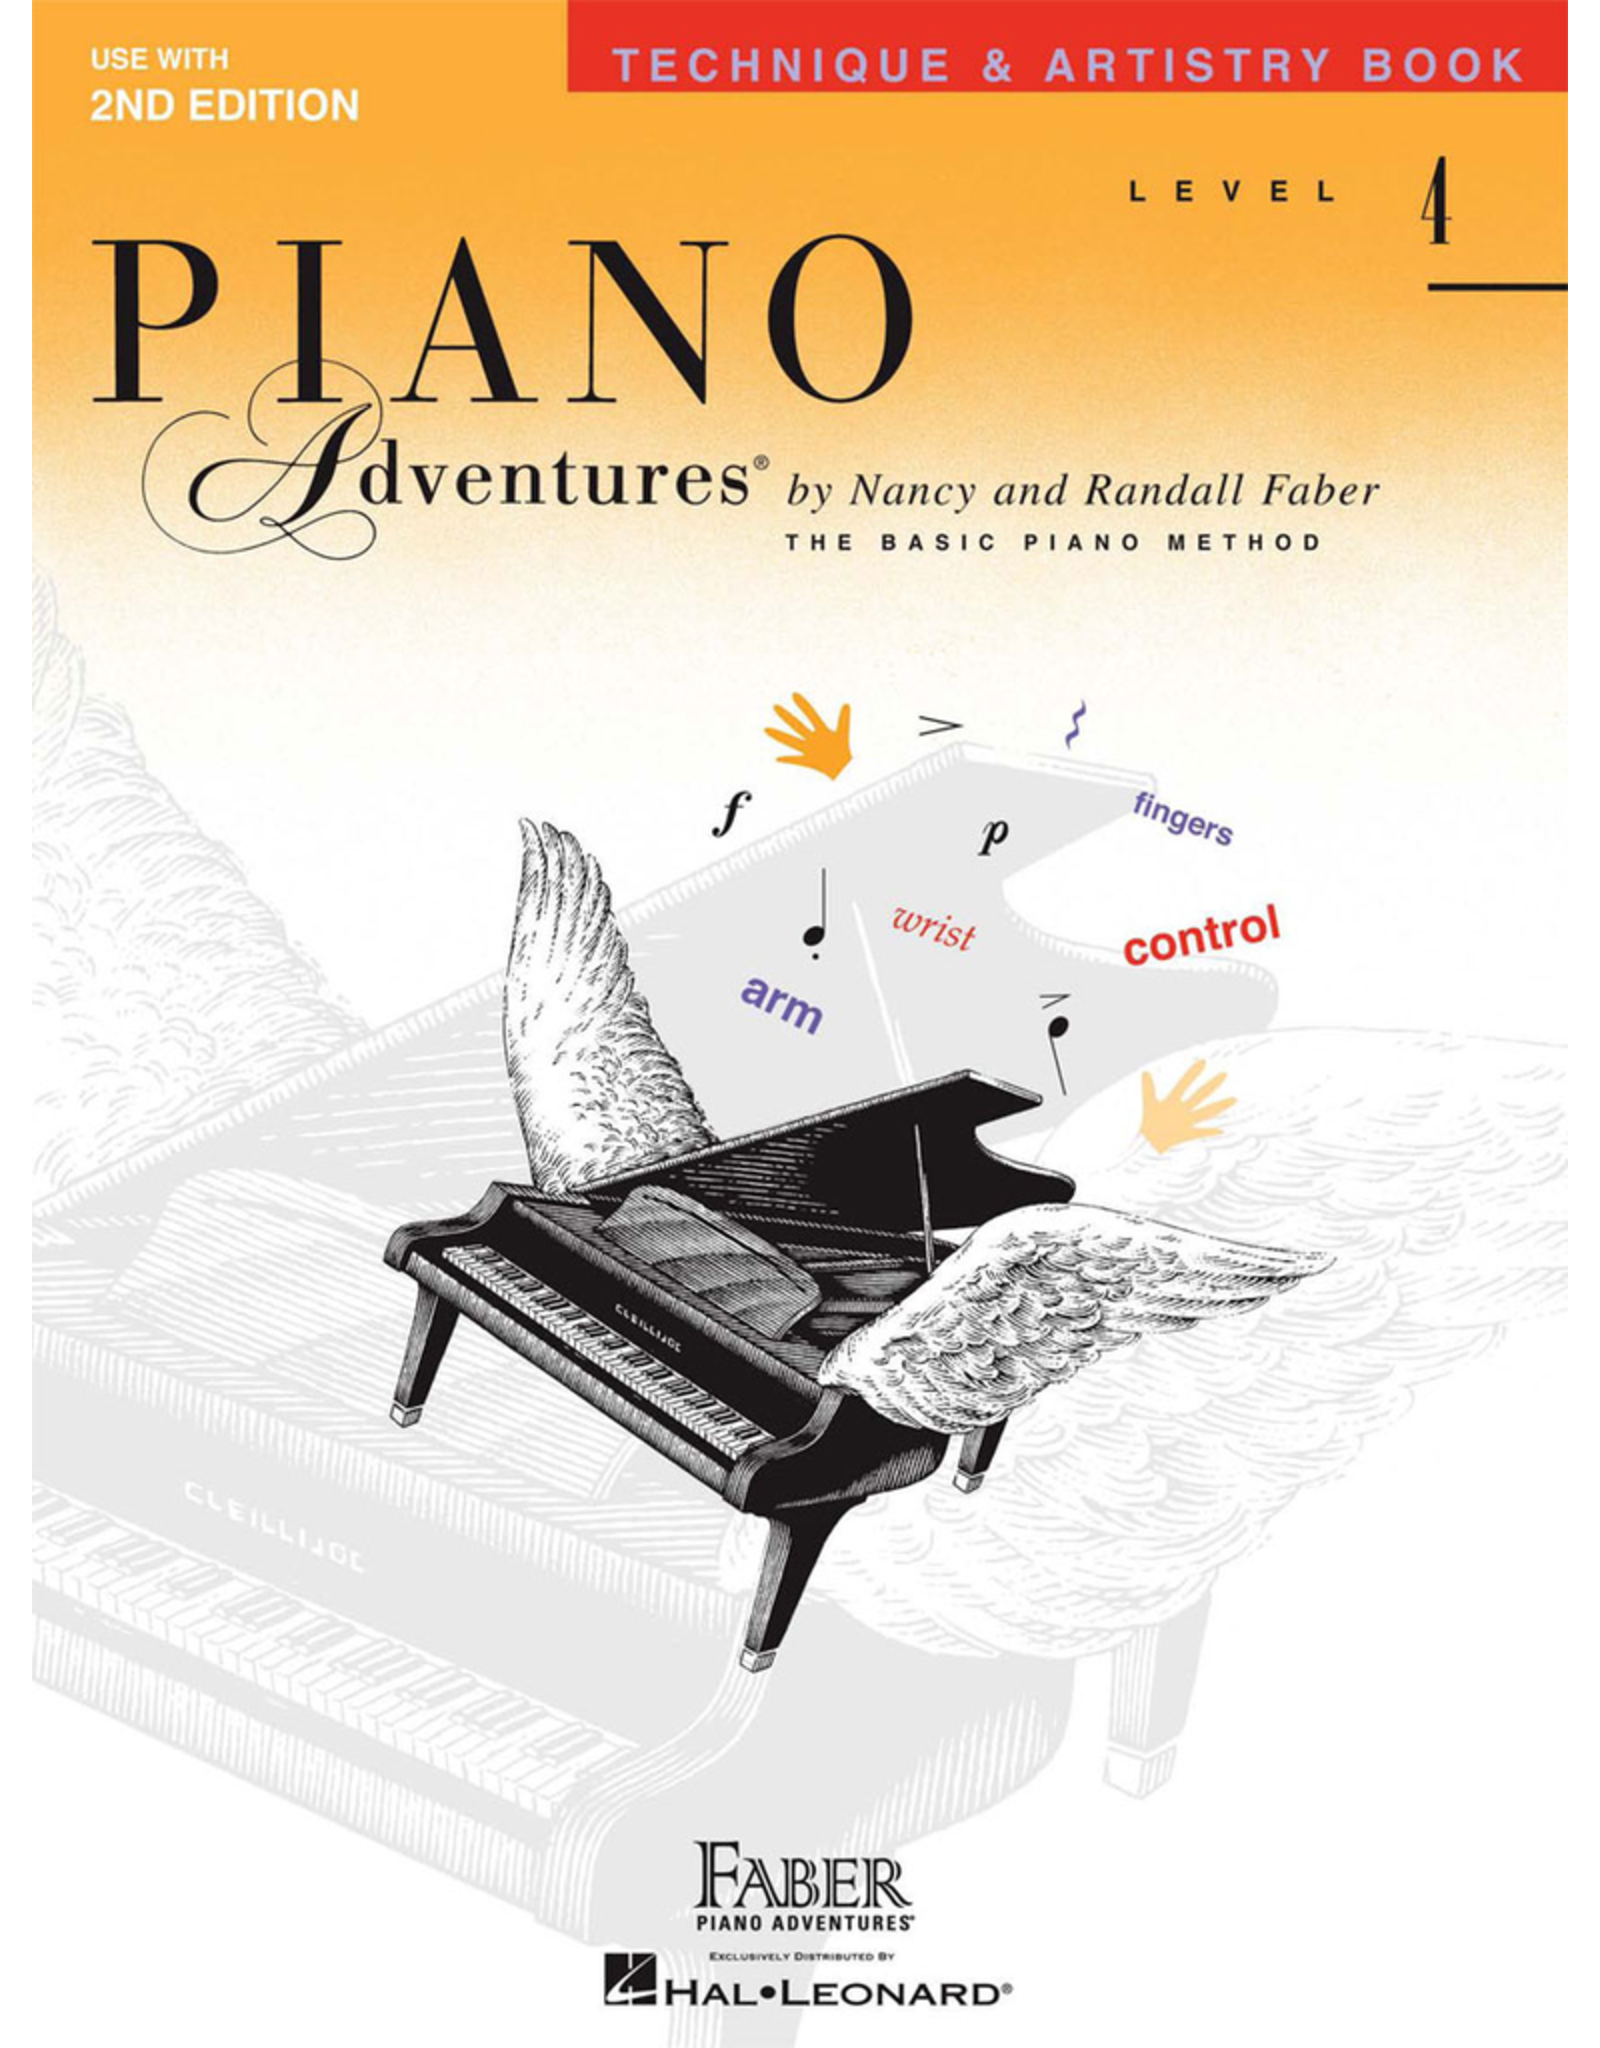 Hal Leonard Piano Adventures Technique & Artistry Level 4 *